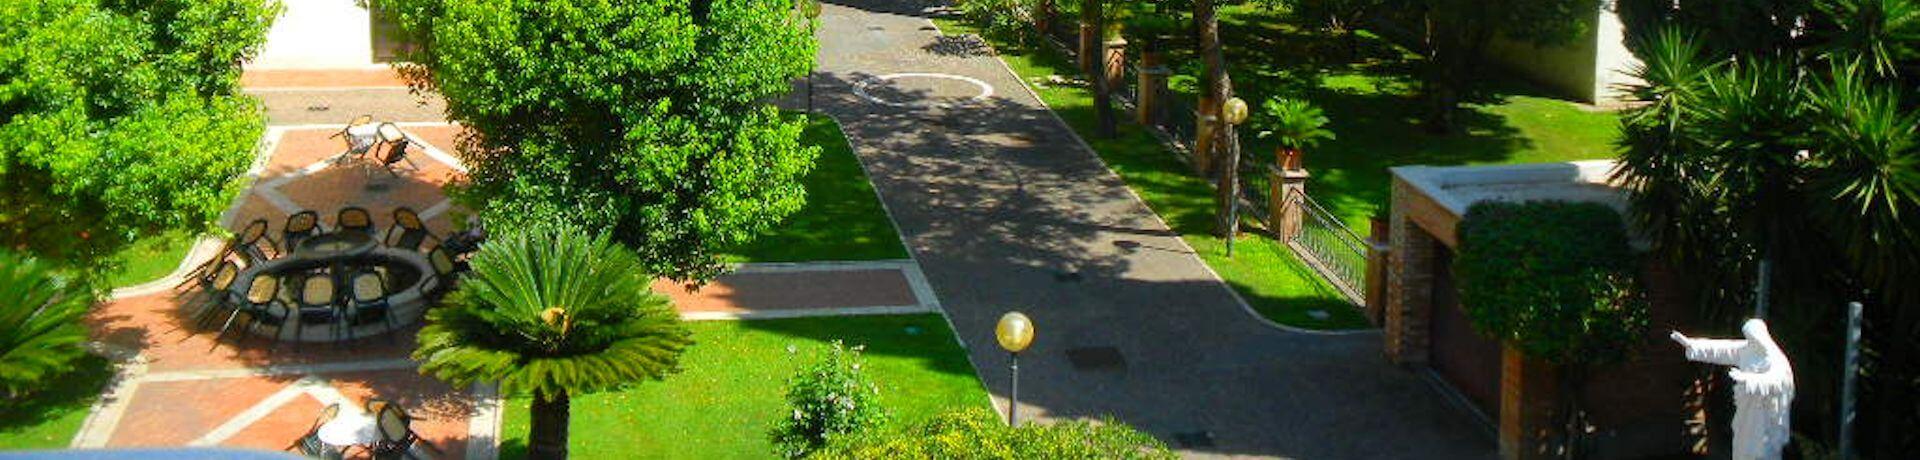 Istituto Sacro Cuore Roma Scuola Sacro Cuore - Panoramica giardino dall'alto